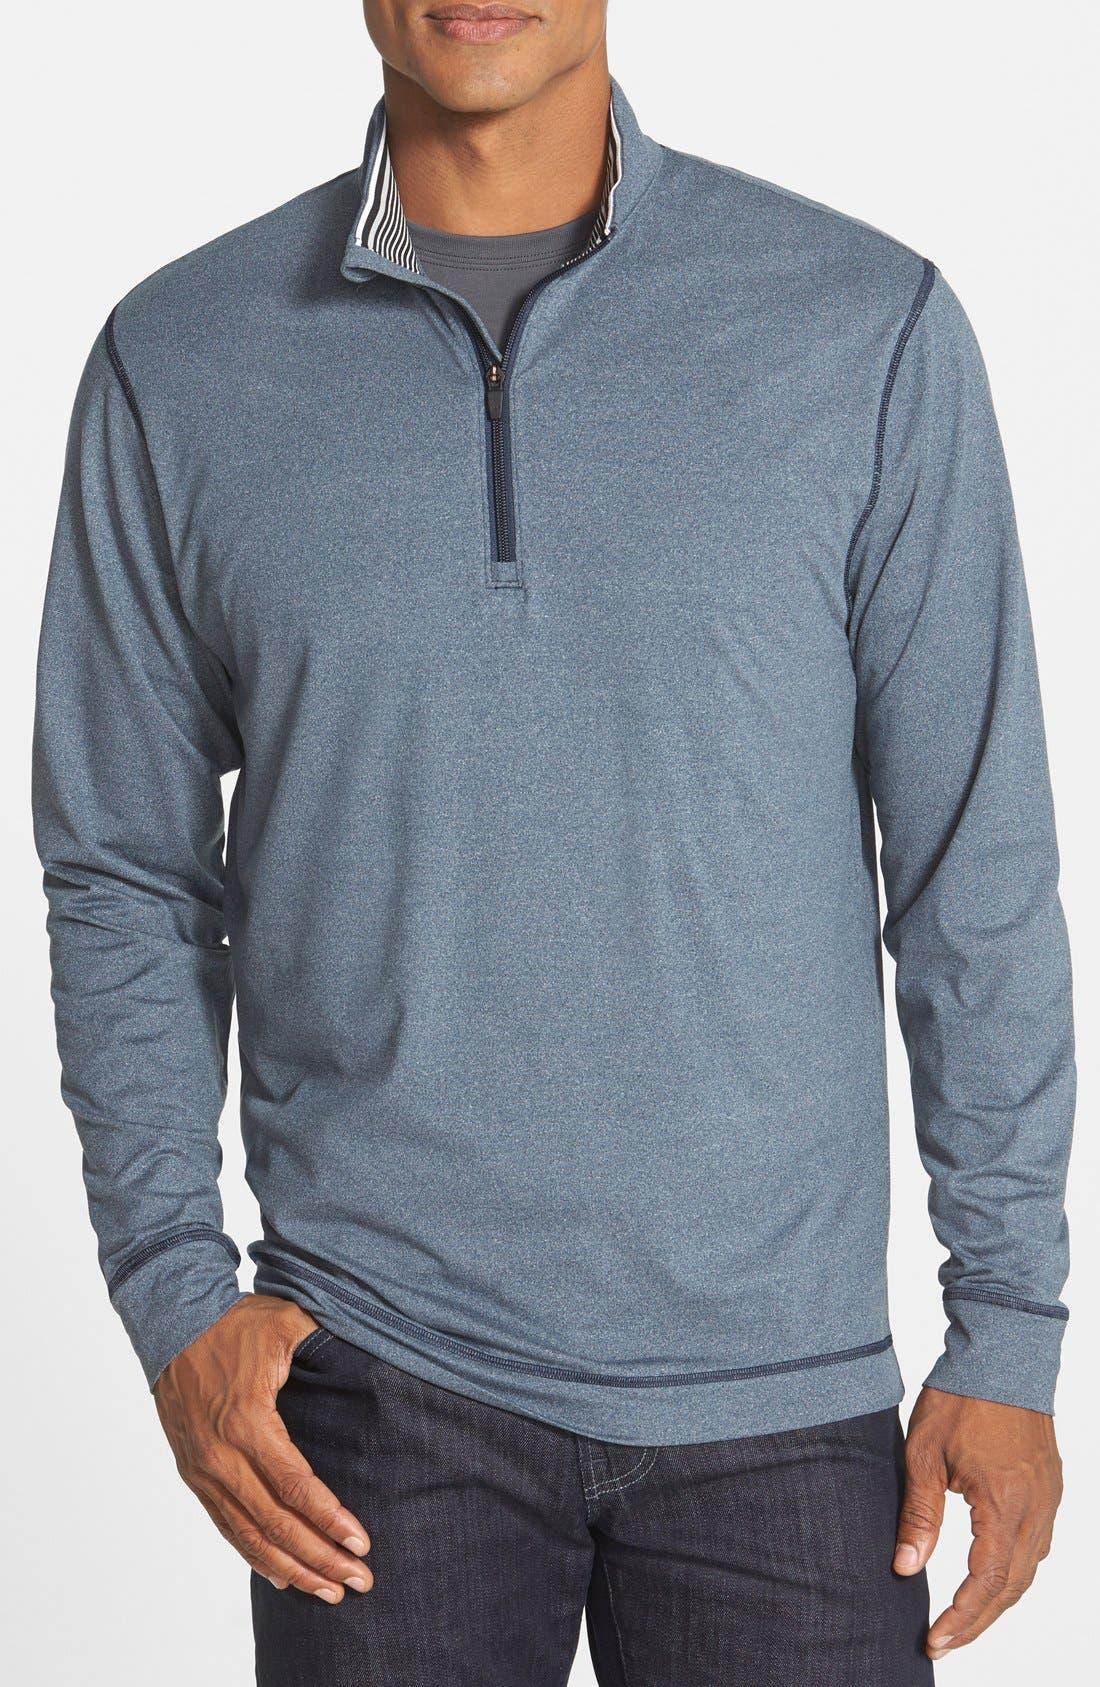 CUTTER & BUCK,                             'Topspin' DryTec Half Zip Pullover,                             Main thumbnail 1, color,                             NAVY HEATHER